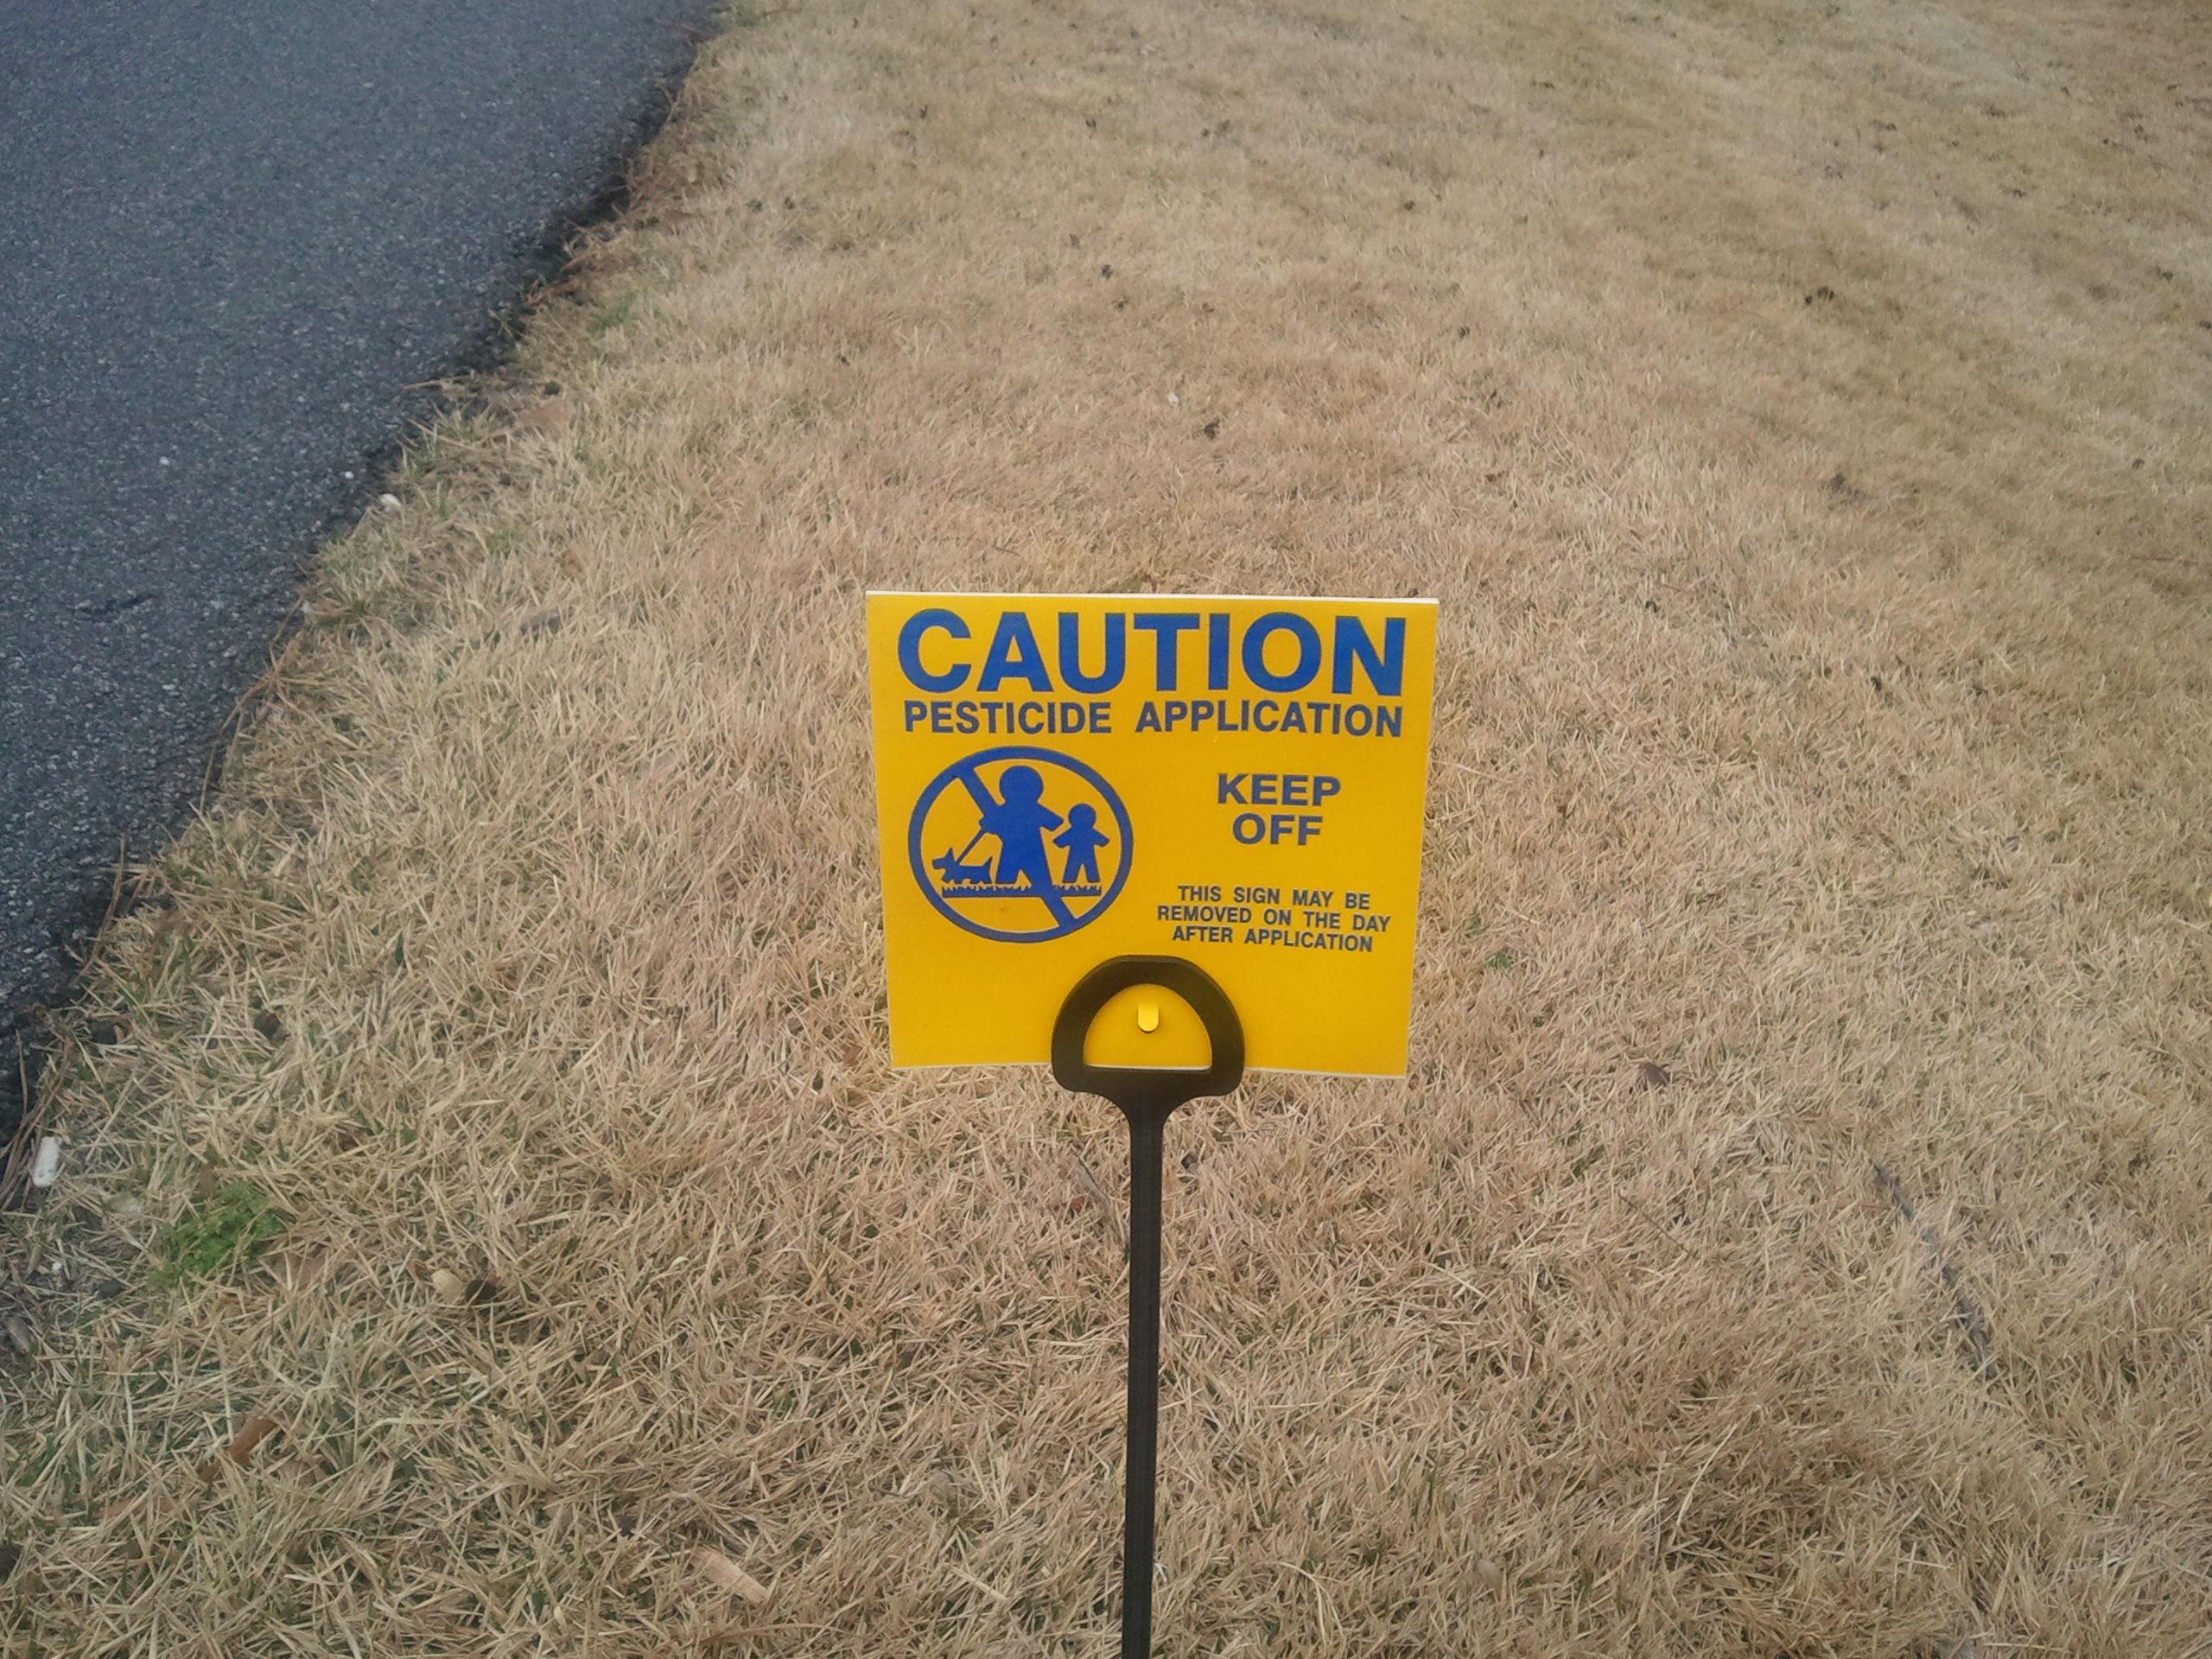 Got weeds pet safe alternatives for a pesticide free lawn by katelyn